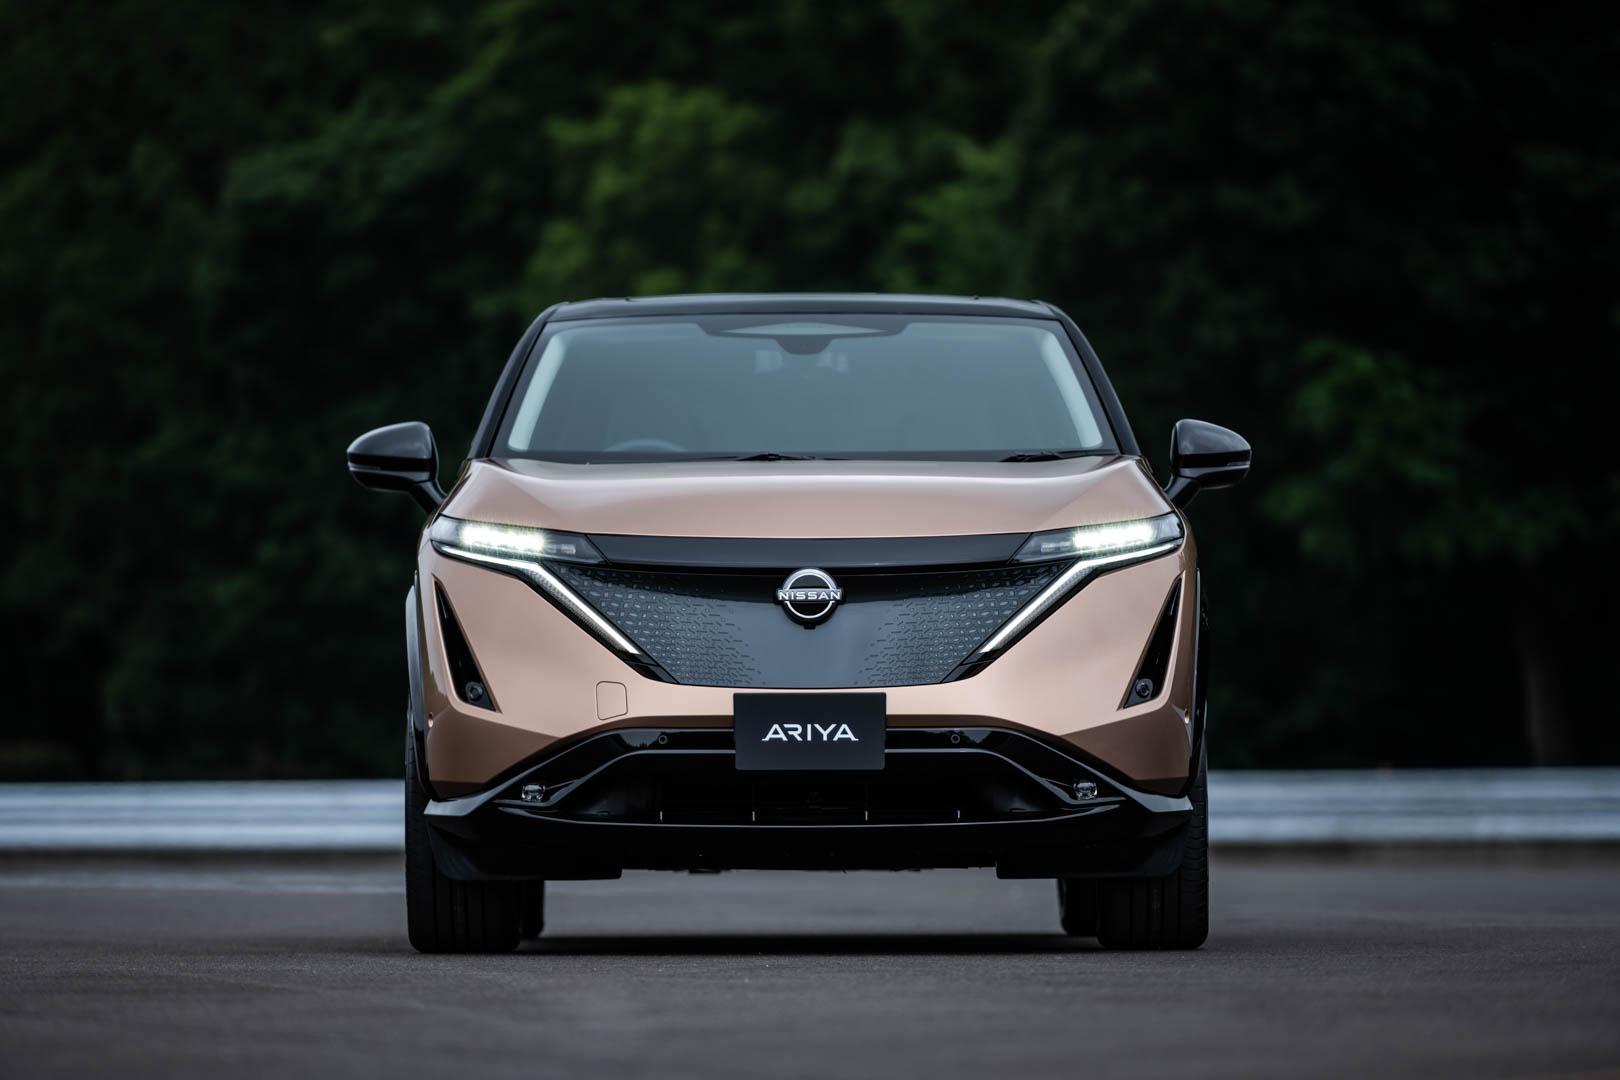 2021 Nissan Ariya 8